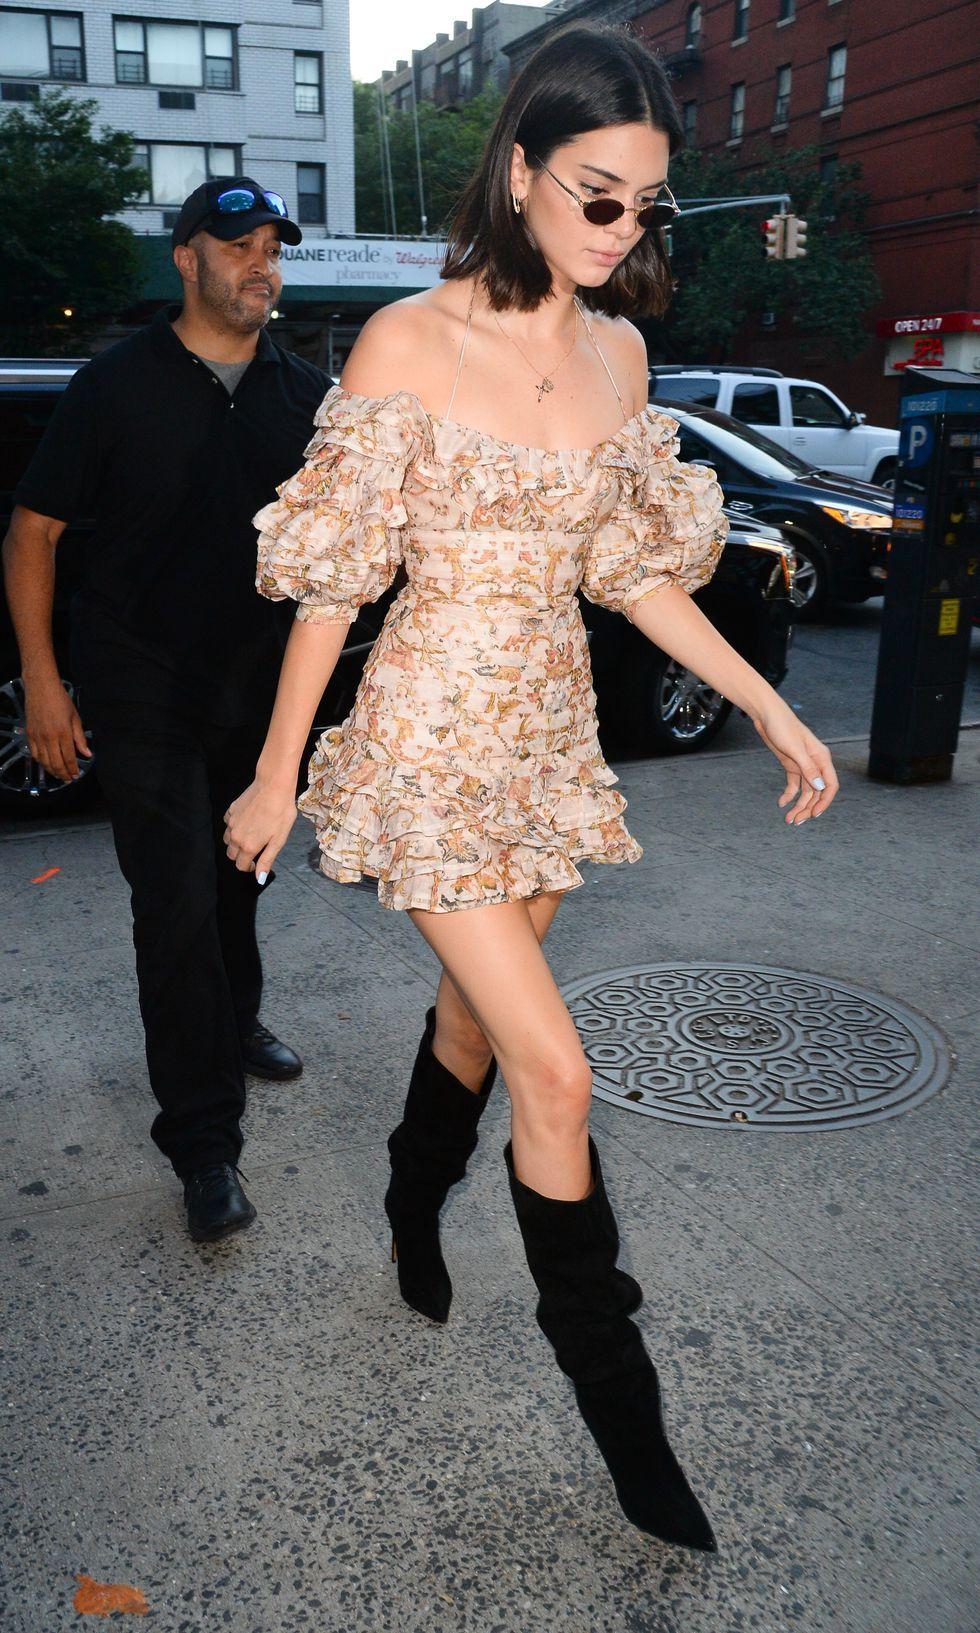 7064e31e775a Kendall & Kylie Jenner's Best Street Style - Kylie & Kendall Jenner Fashion